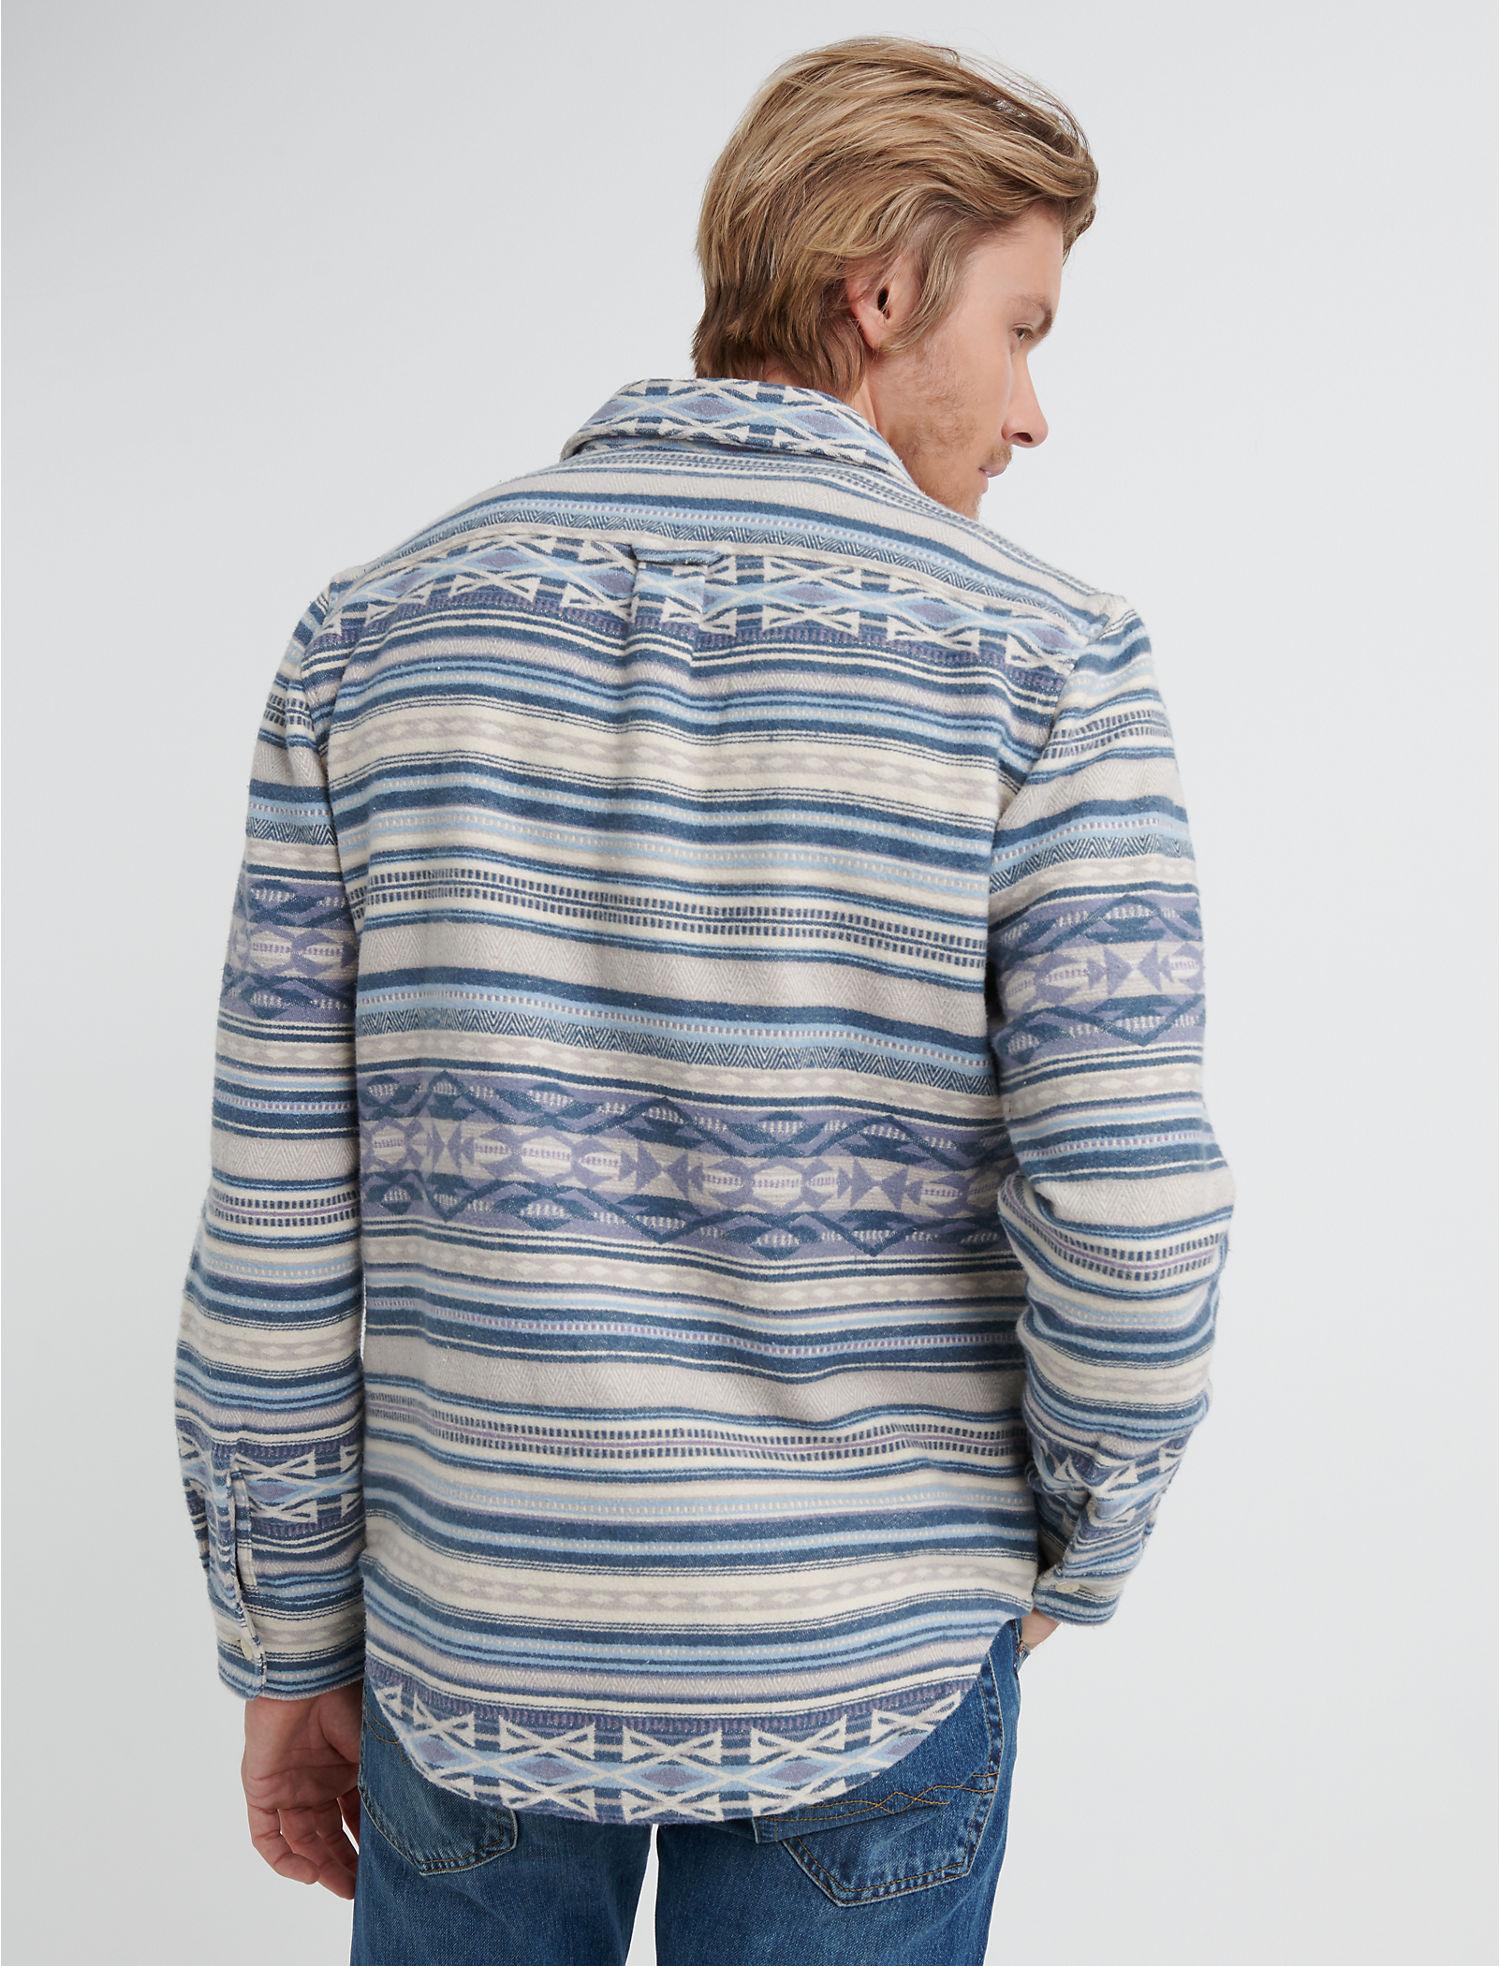 48eaeff530 Lucky Brand Mens Alta Vista Flannel Shirt Jacket L Blue Stripe